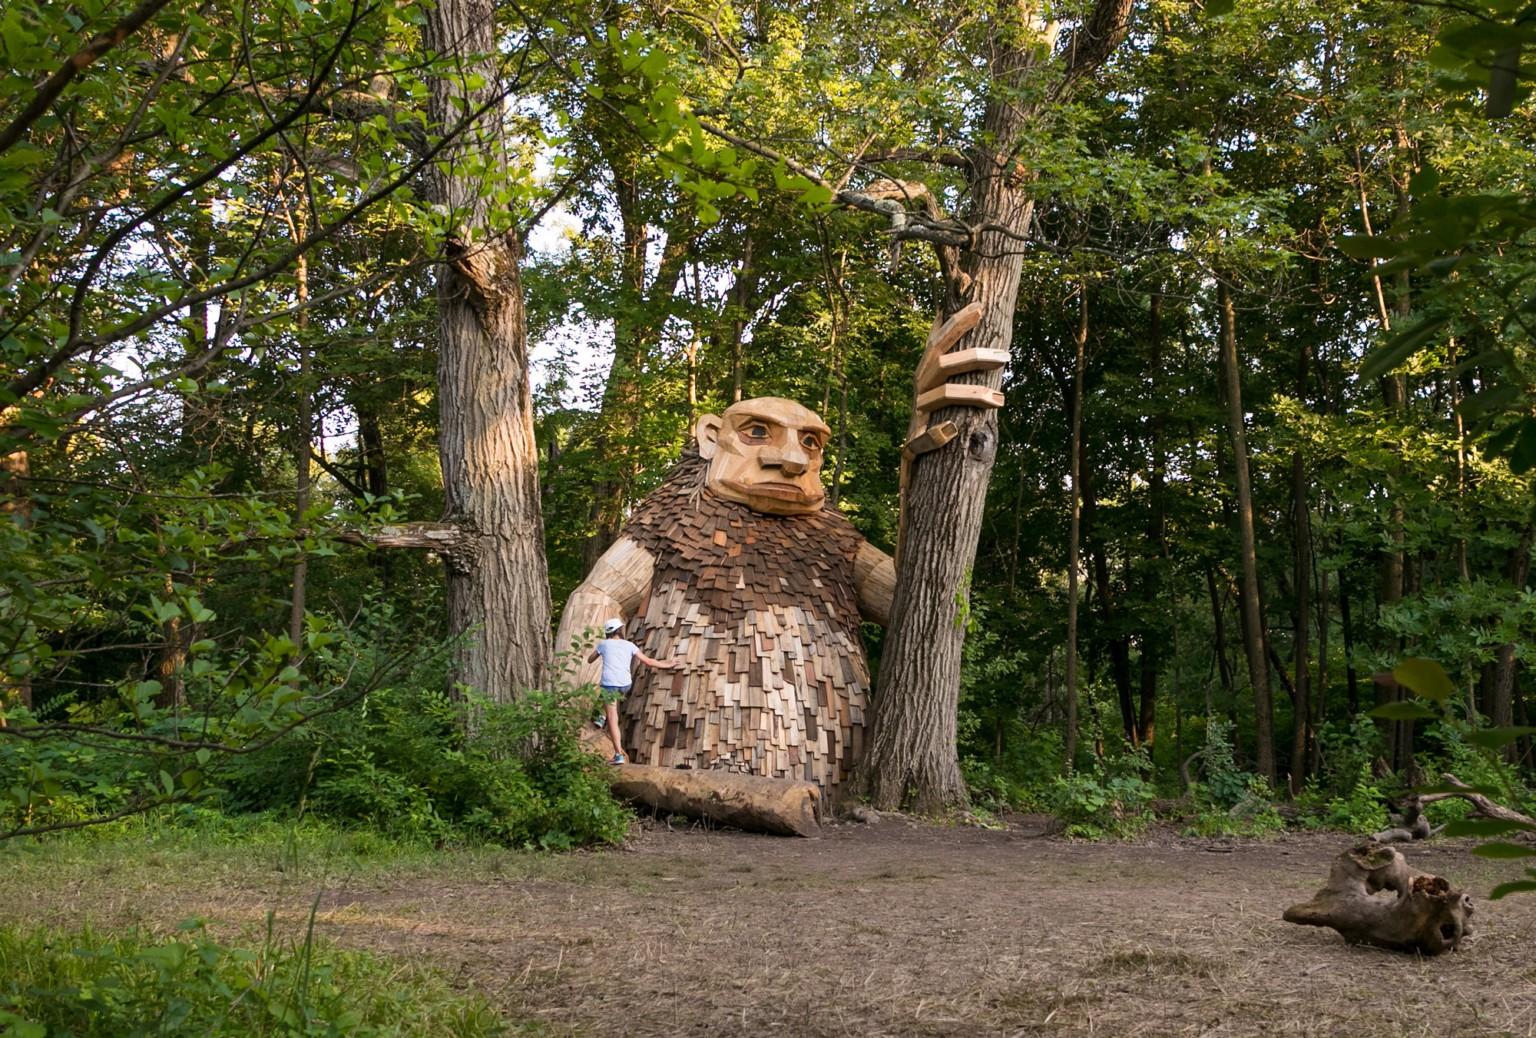 Mischievous Wooden Trolls Take Over an Arboretum in Northern Illinois